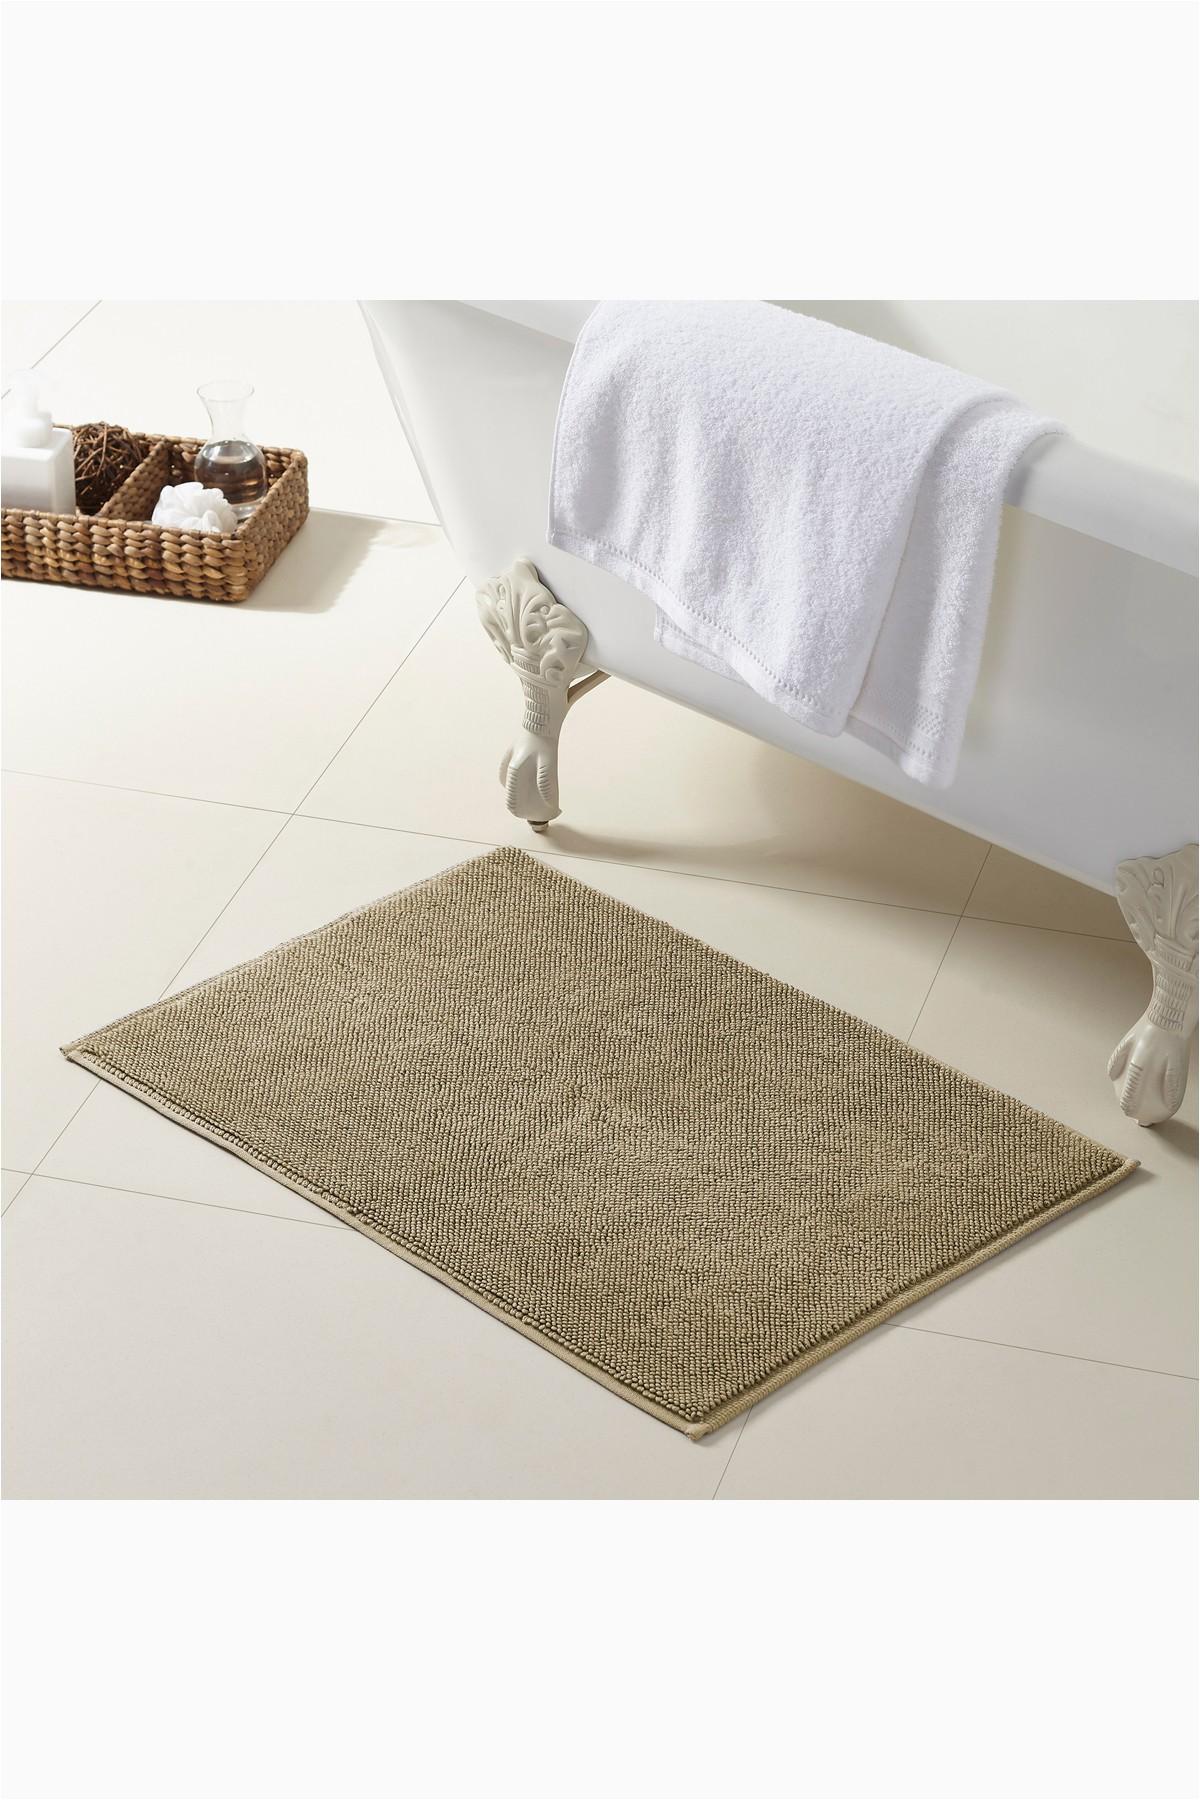 All Cotton Reversible Bath Rugs Modern Threads Turkish Cotton Reversible Bath Rug Oatmeal